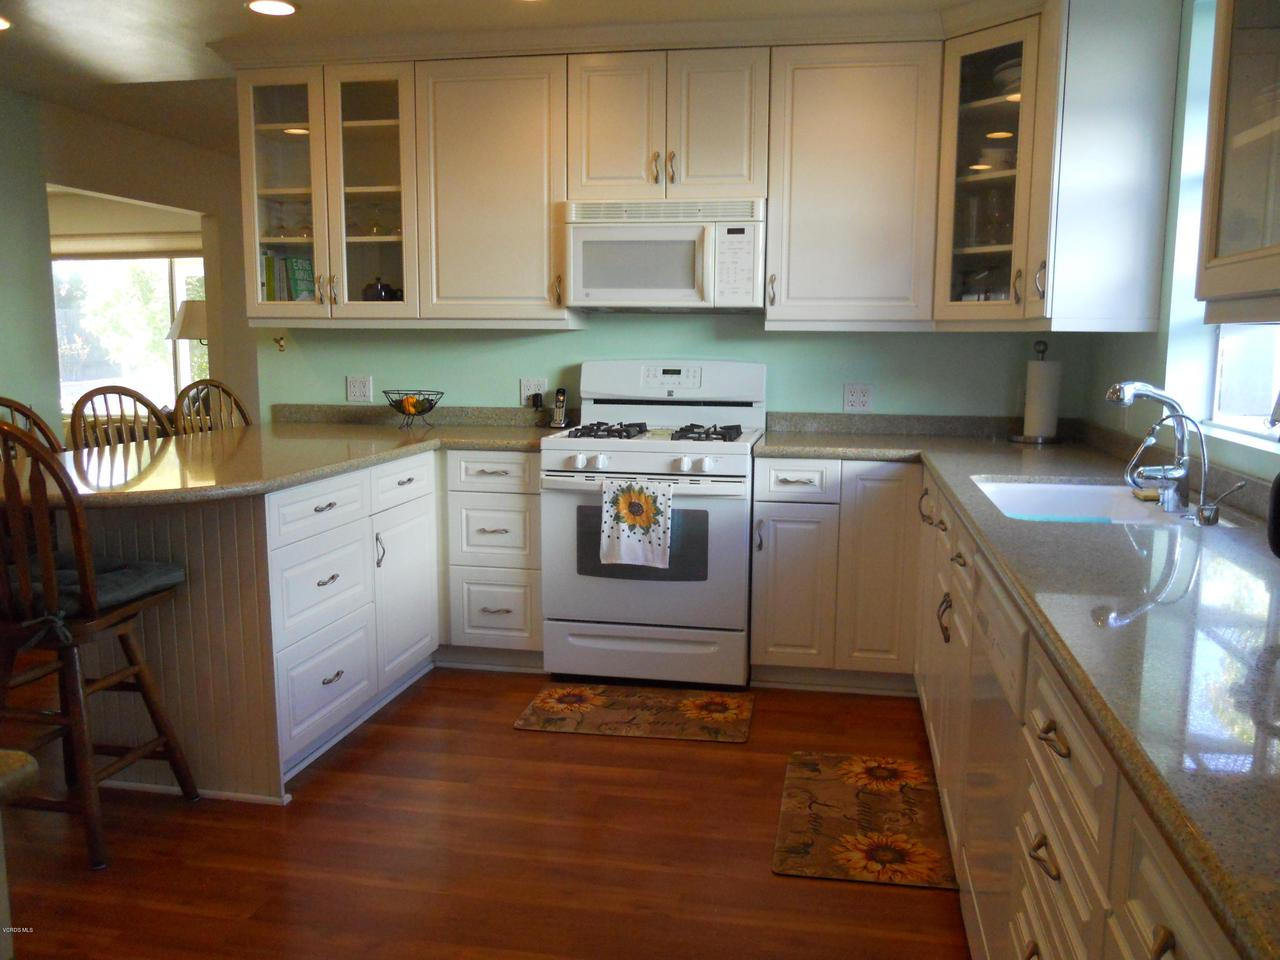 1207 SEYBOLT, Camarillo, CA 93010 - Kitchen